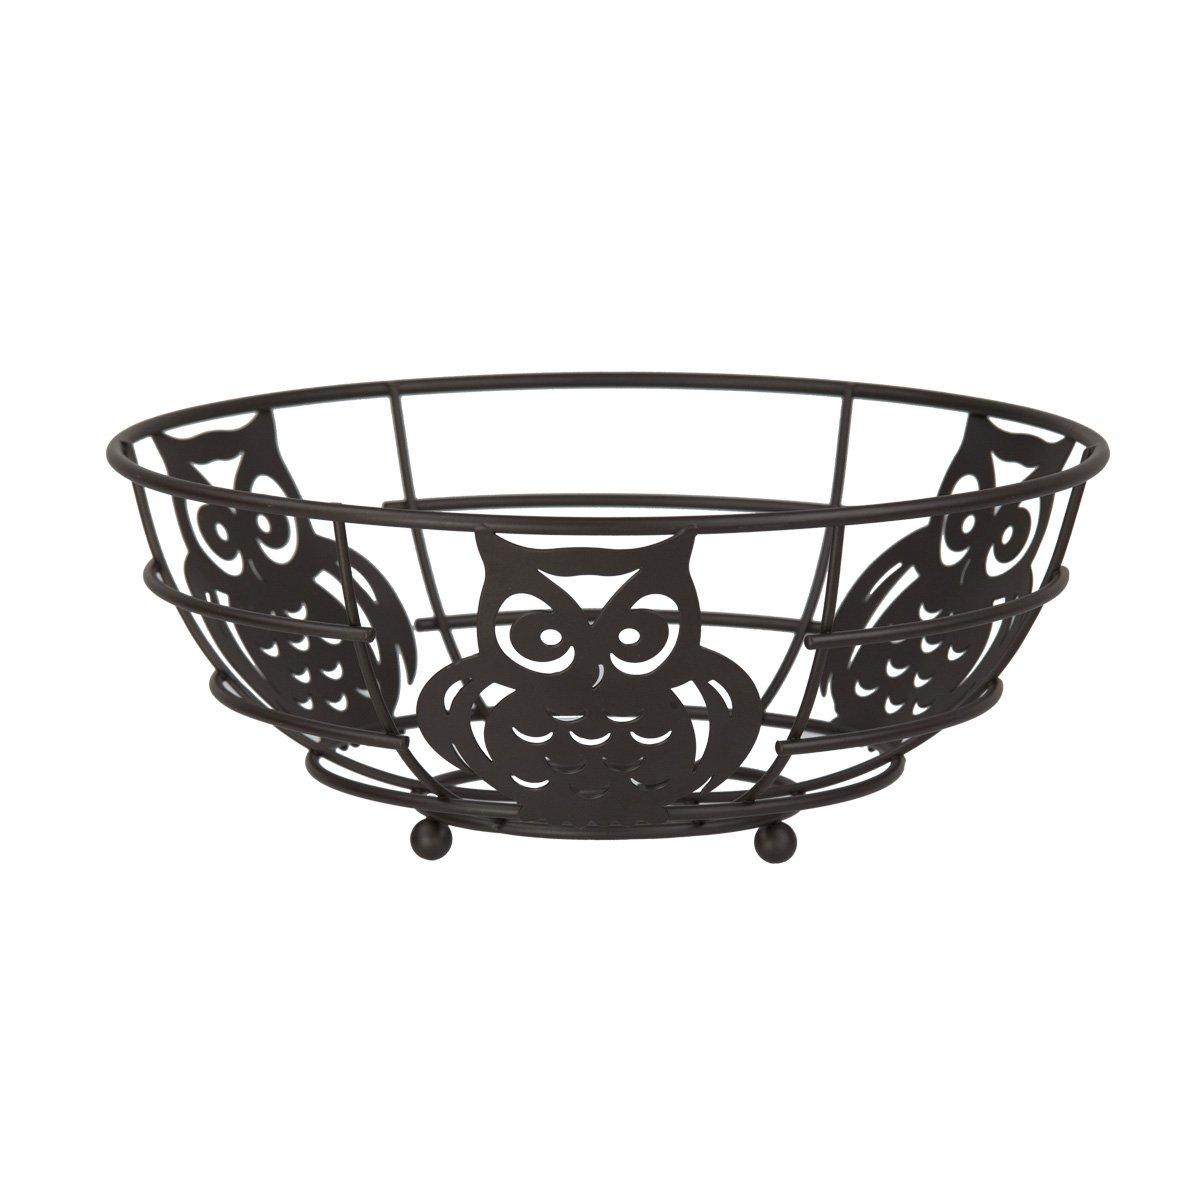 "Home Basics FB44122 Owl Fruit Bowl, 11"" x 11"" x 4.75"""